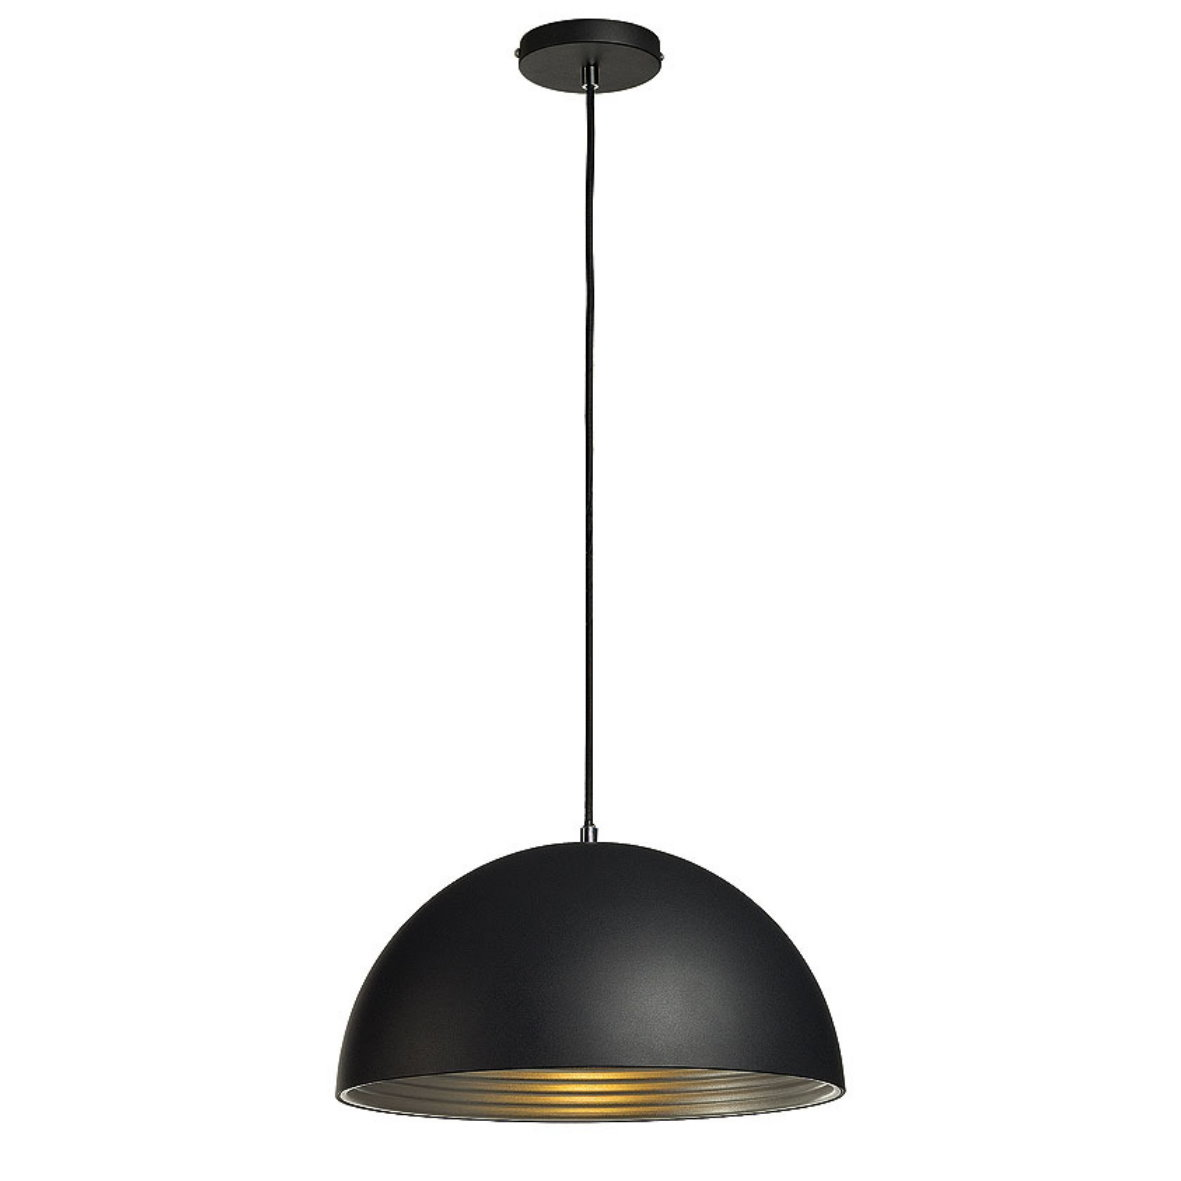 Slv pendule lampe forchini pendule lampe luminaire for Suspendu luminaire